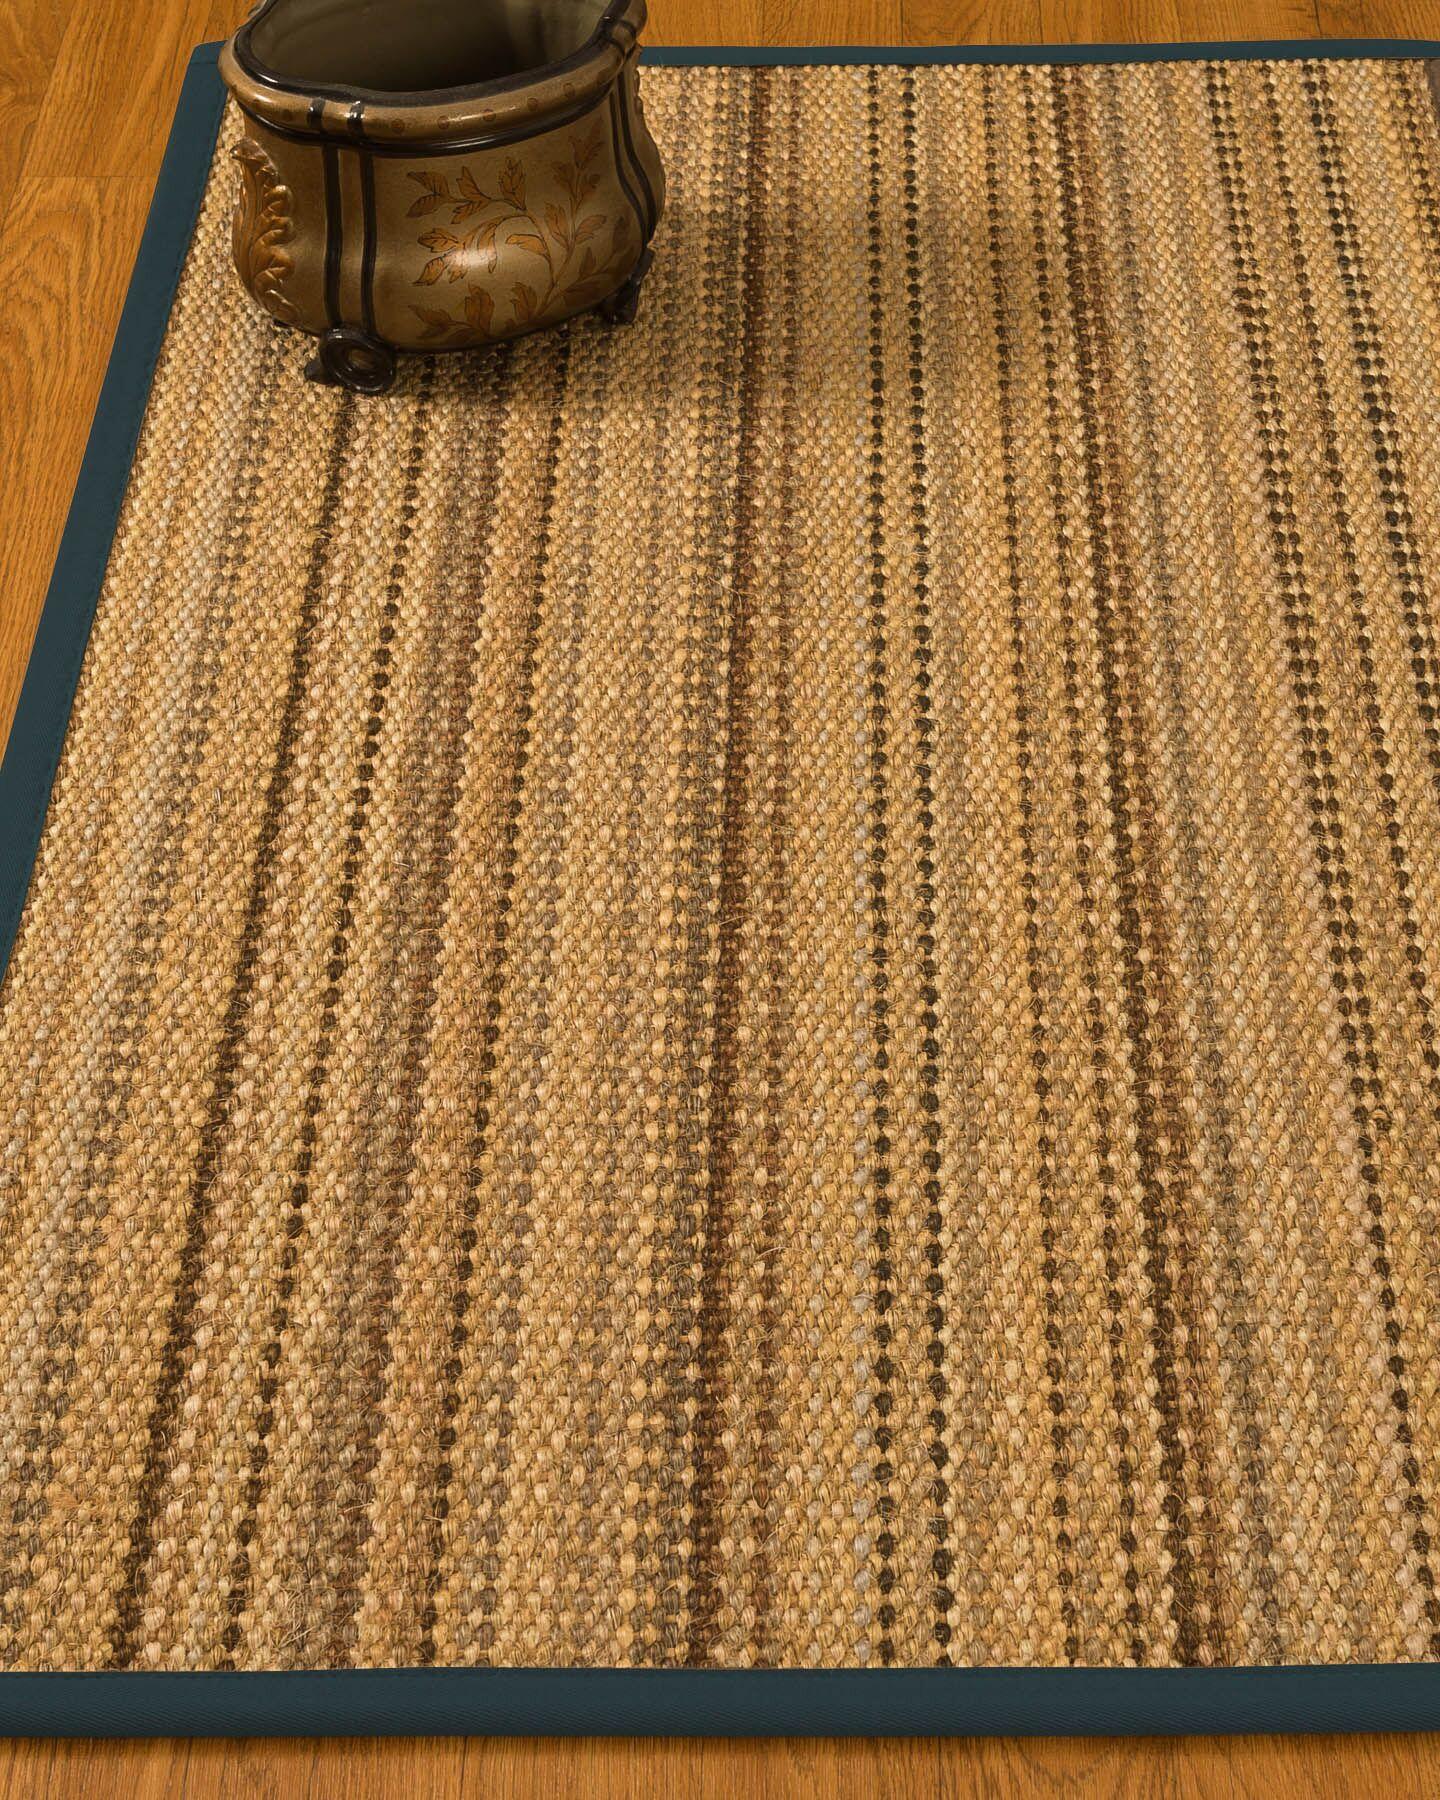 Kimmel Hand-Woven Beige Area Rug Rug Size: Rectangle 6' x 9'